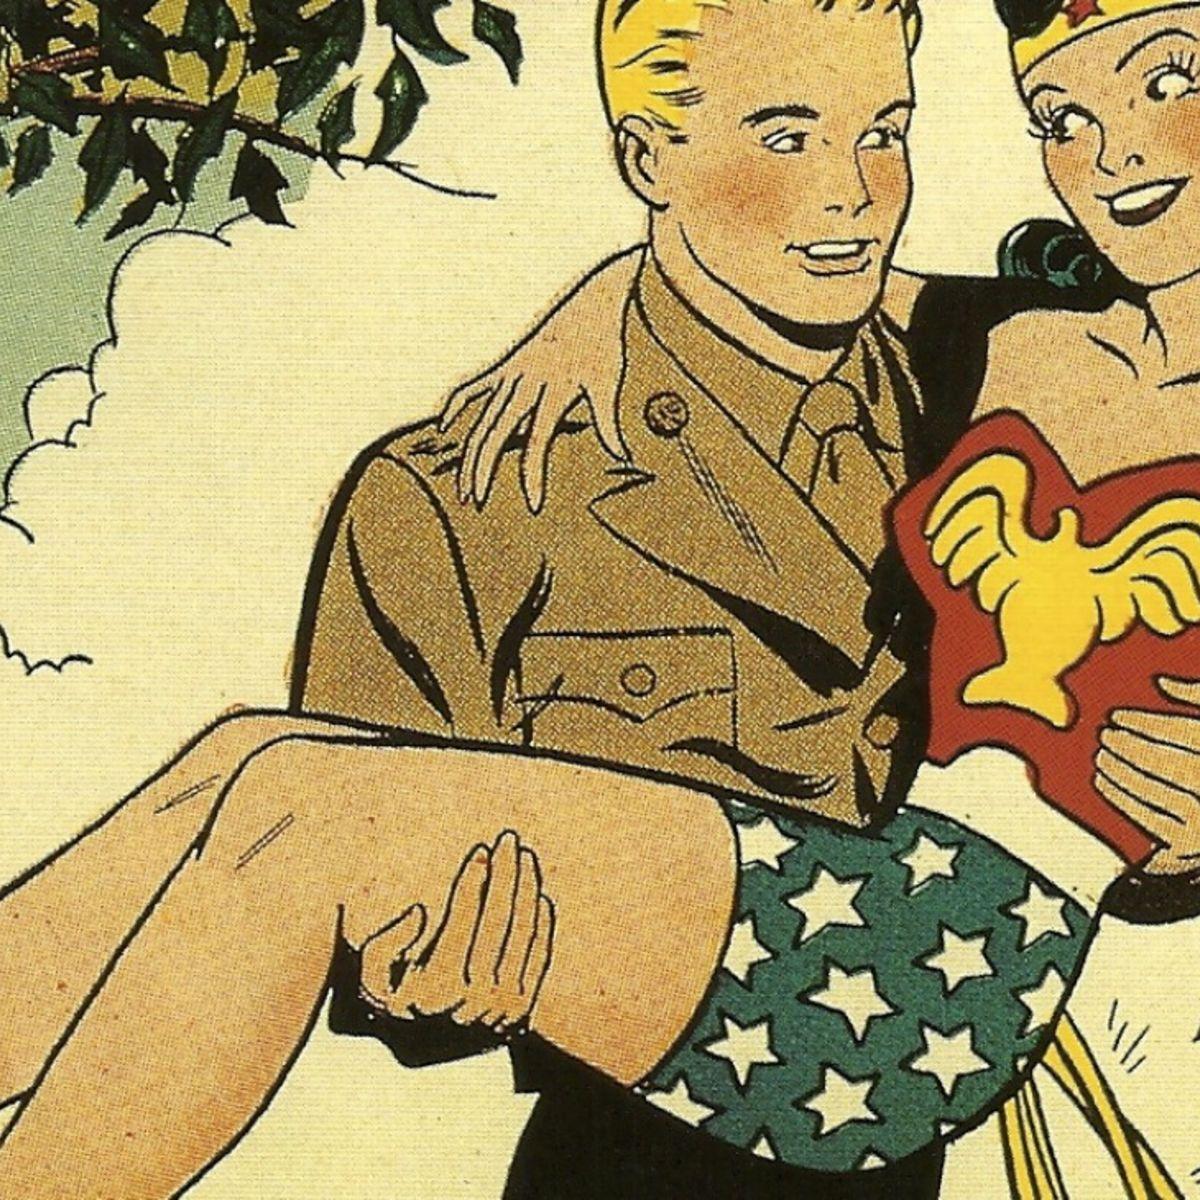 Wonder-Woman-comic-period.jpg